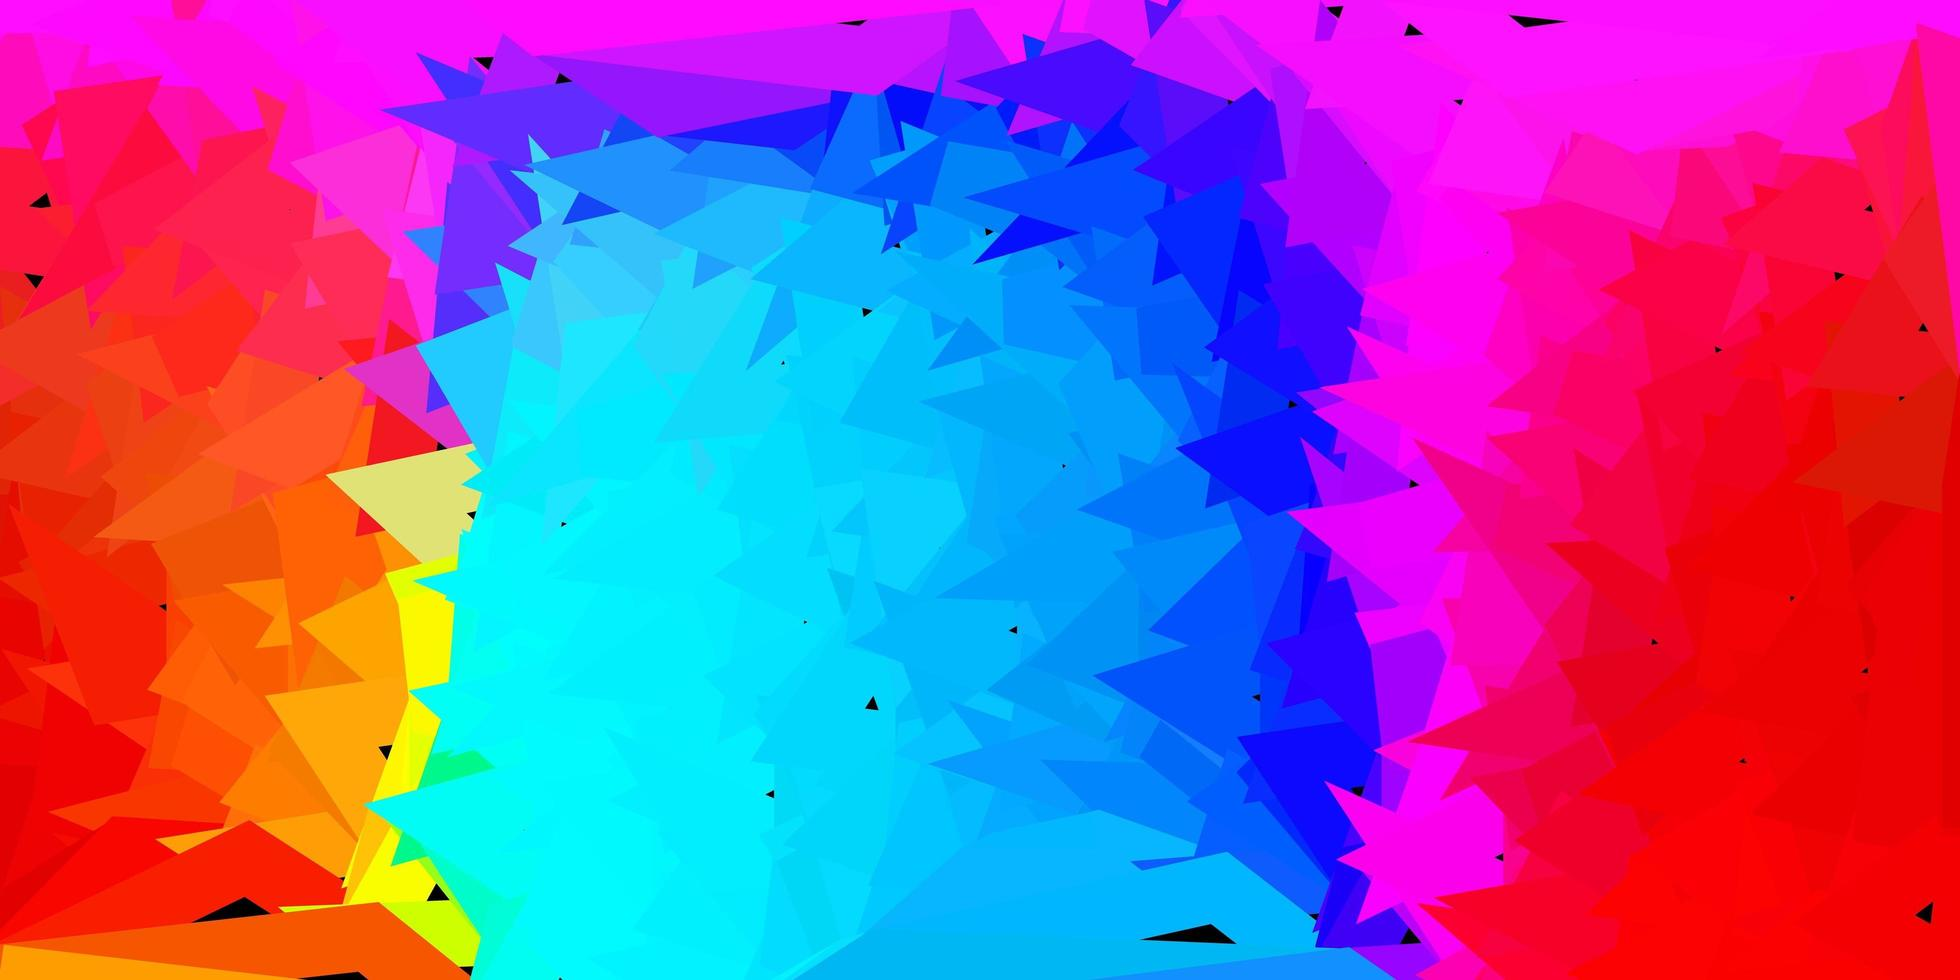 mörkblå, röd vektor triangel mosaik bakgrund.